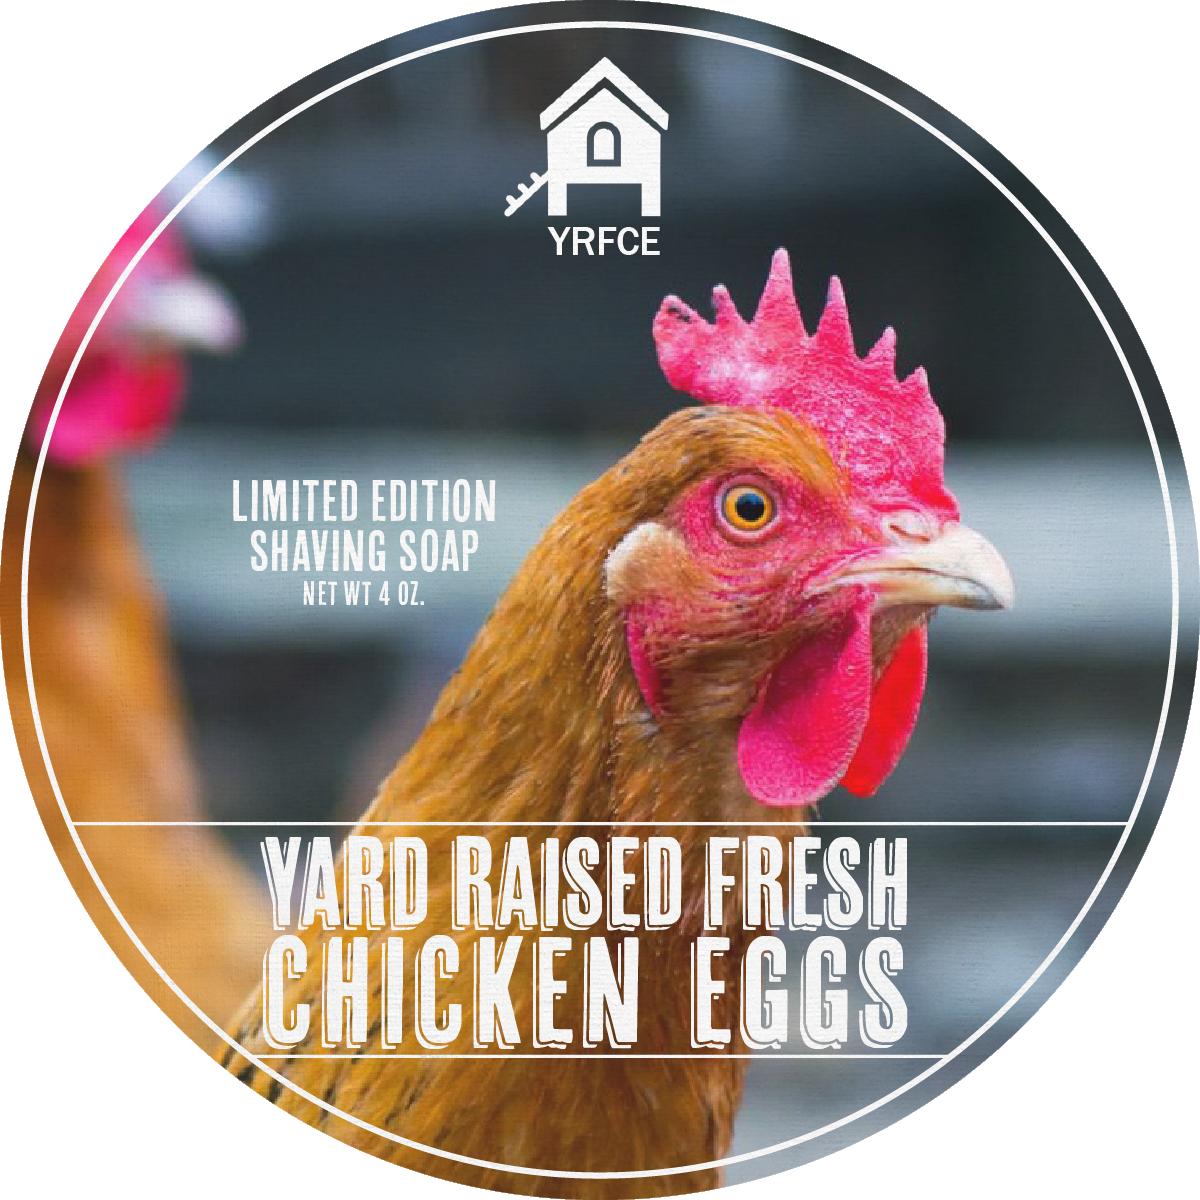 YRFCE - Yard Raised Fresh Chicken Eggs - Soap image